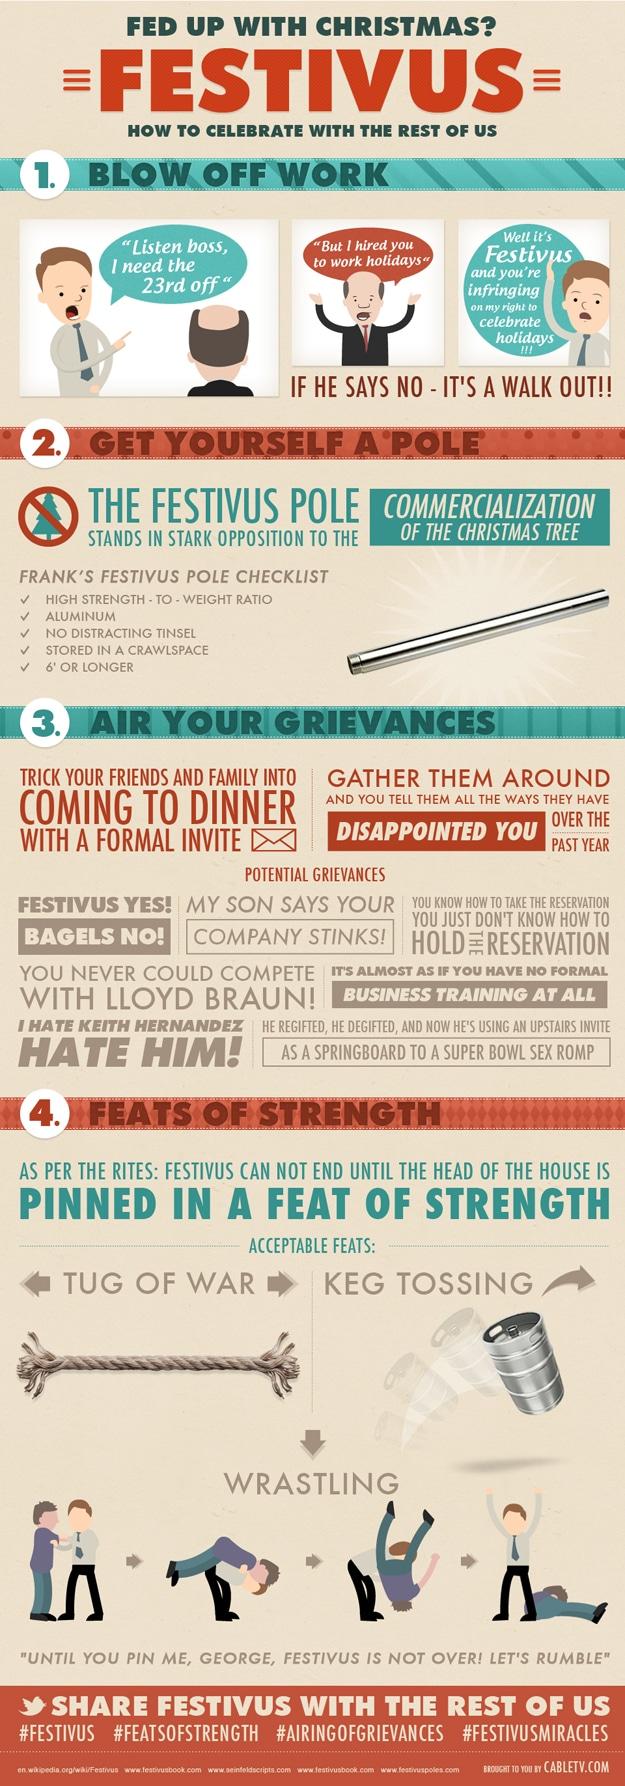 How To Celebrate Festivus